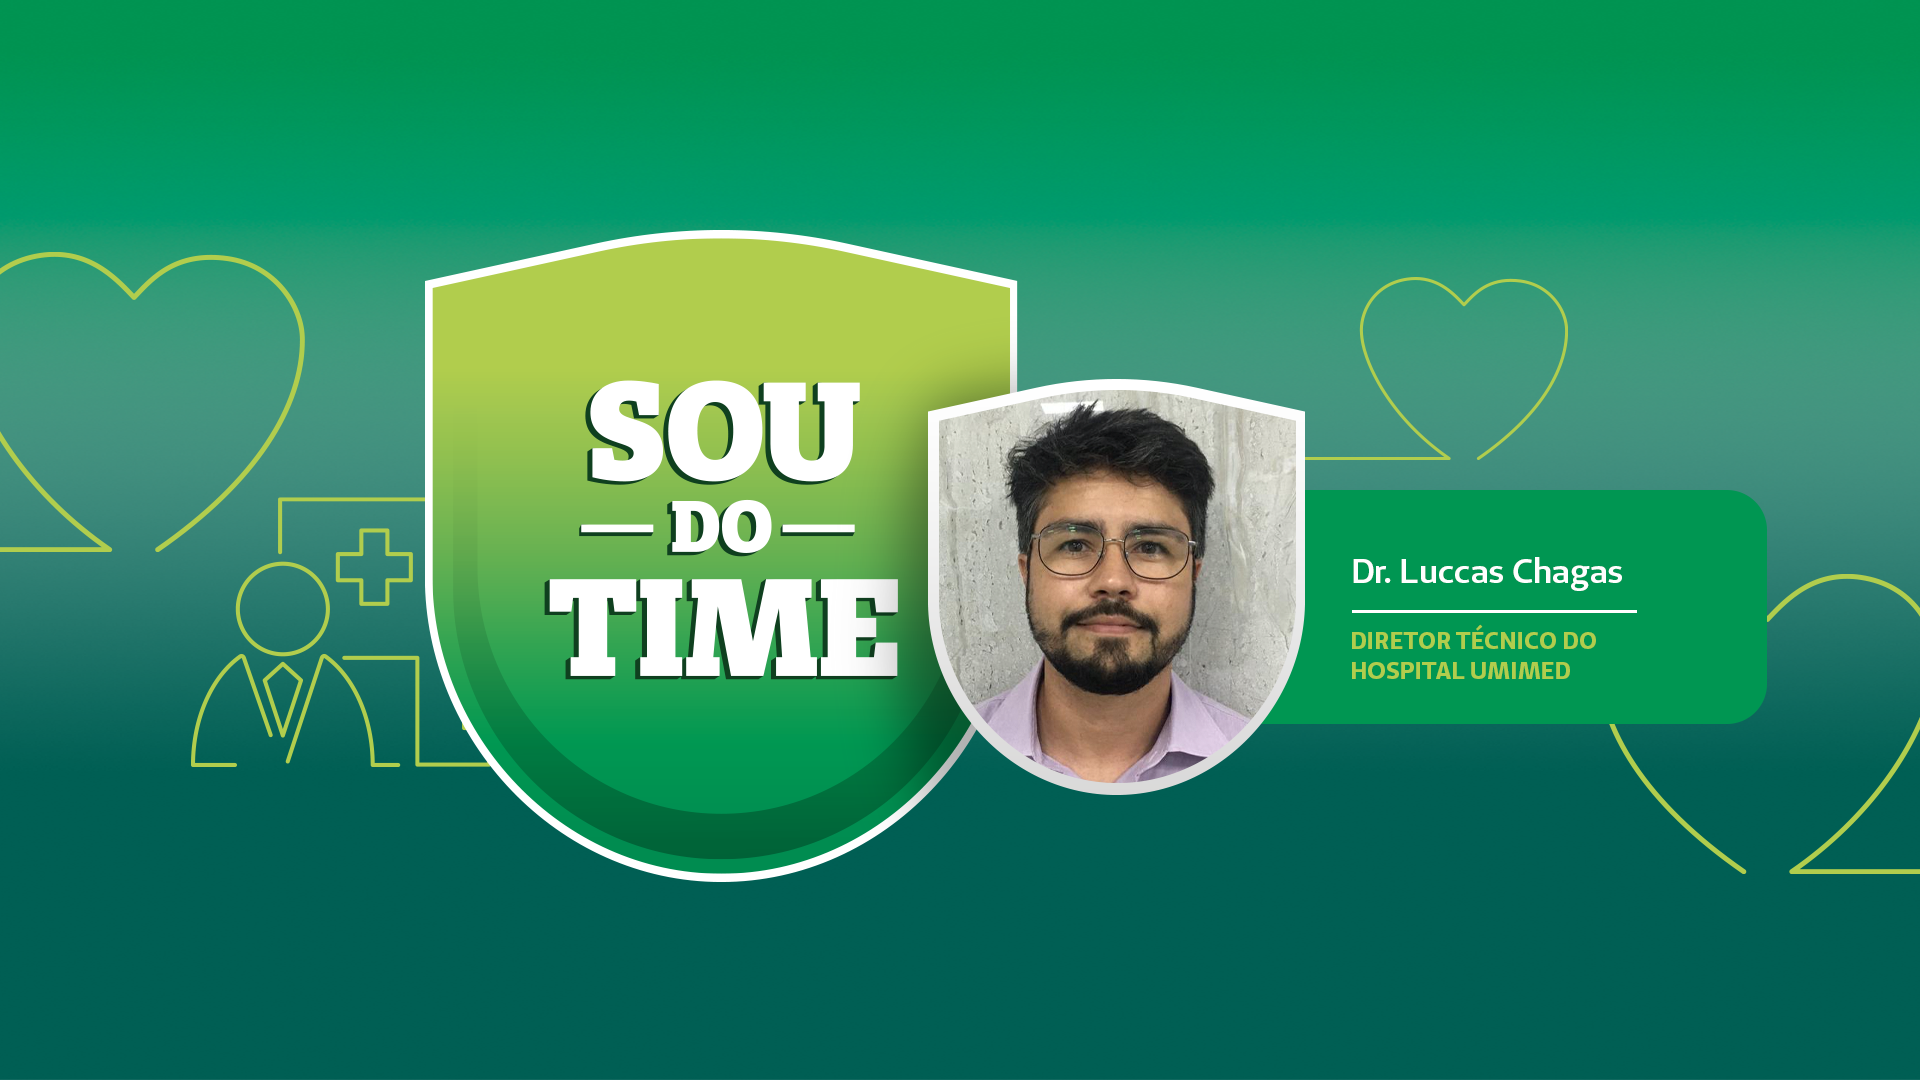 BANNER-PRINCIPAL_SOU-DO-TIME_DR-LUCAS.png